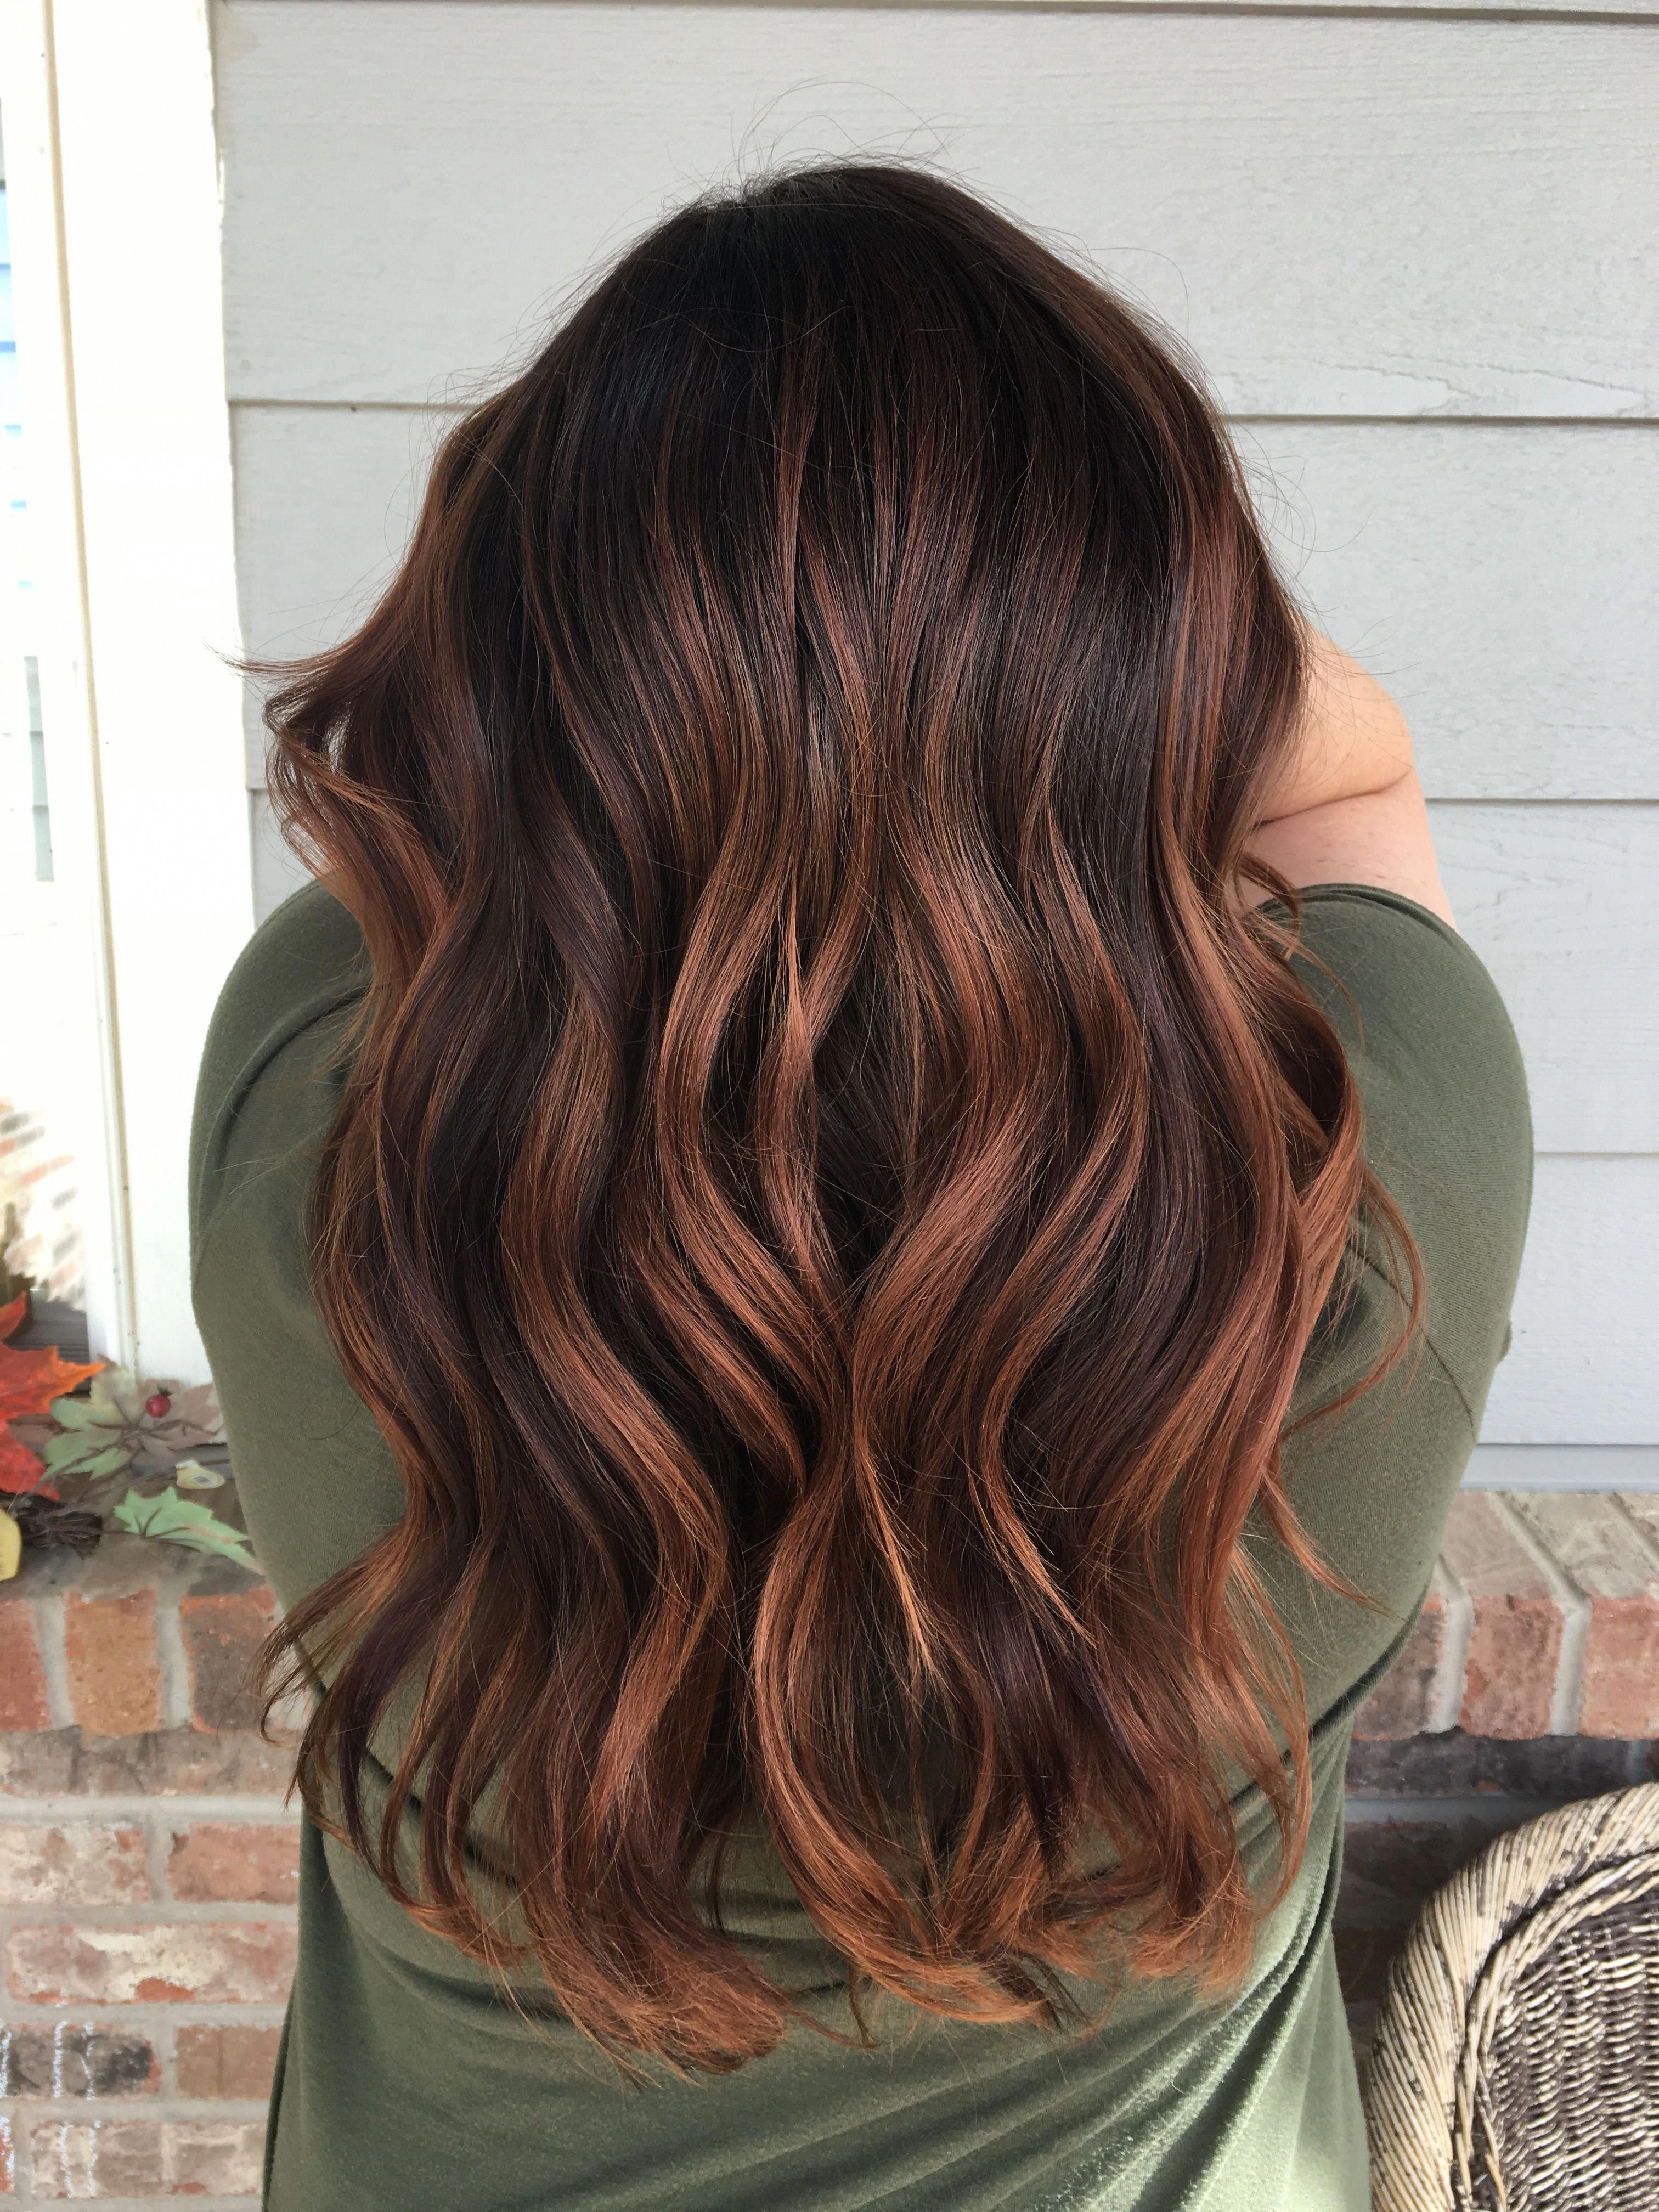 Blackberry Hair Color: The Trendiest Hair Color -